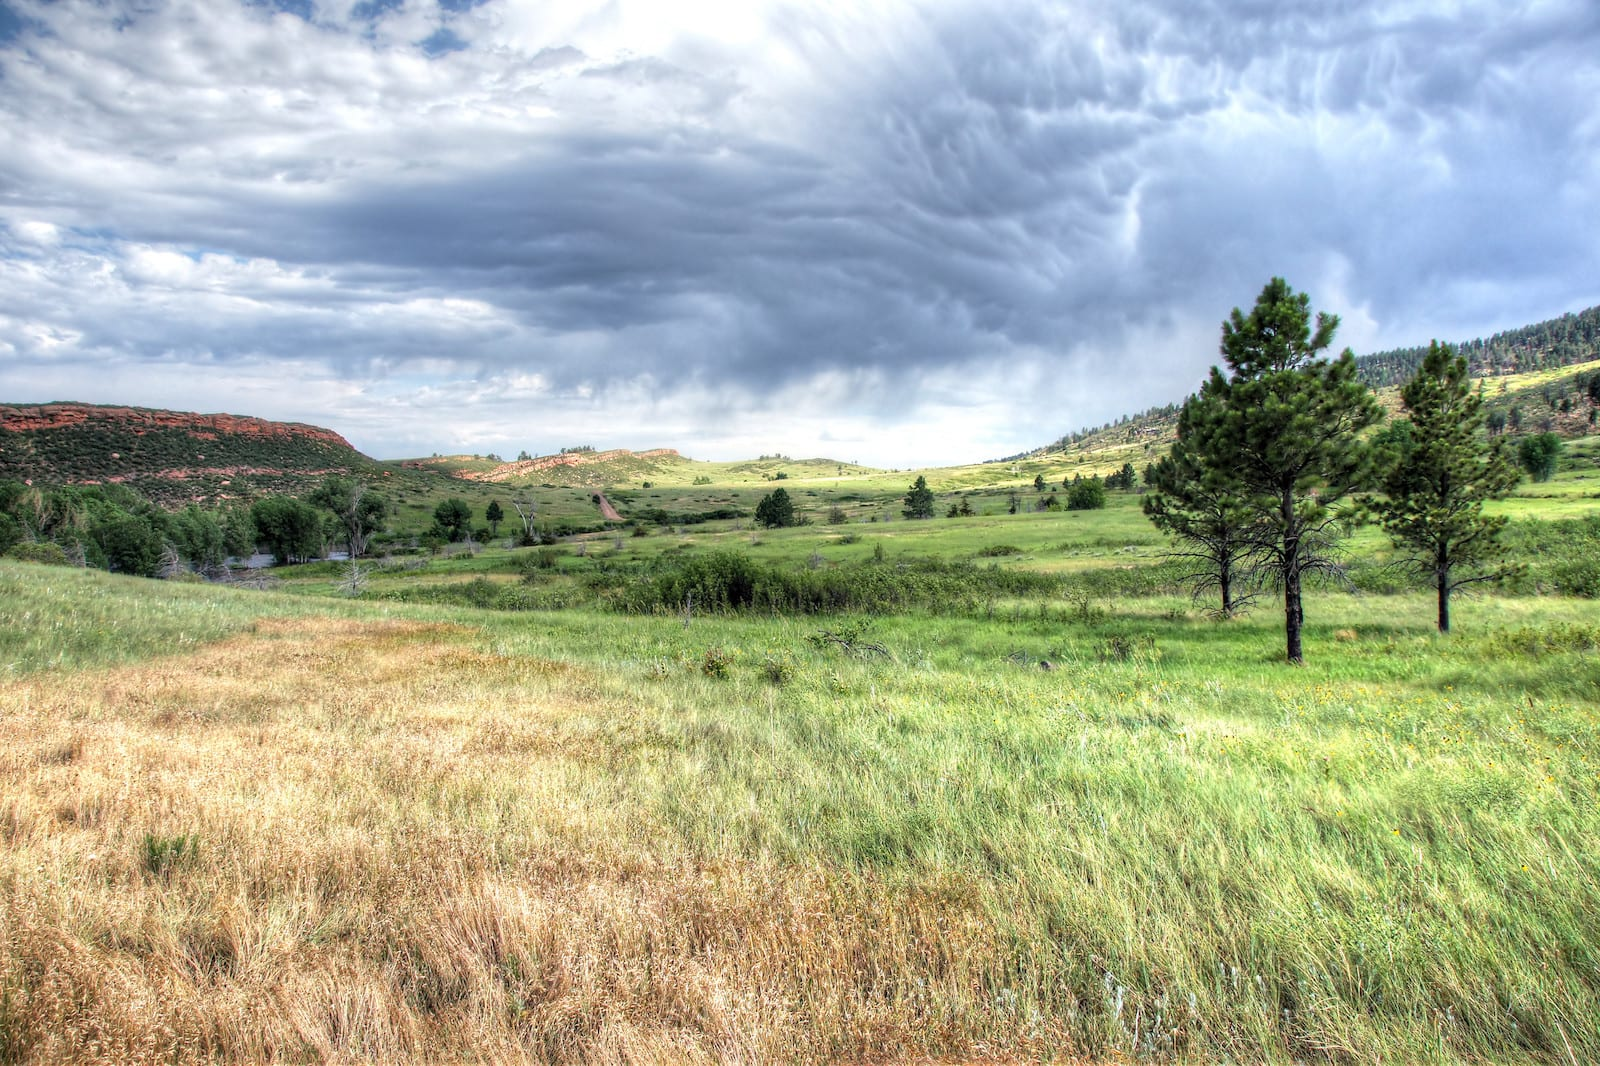 Lory State Park Colorado Cloudy Sky